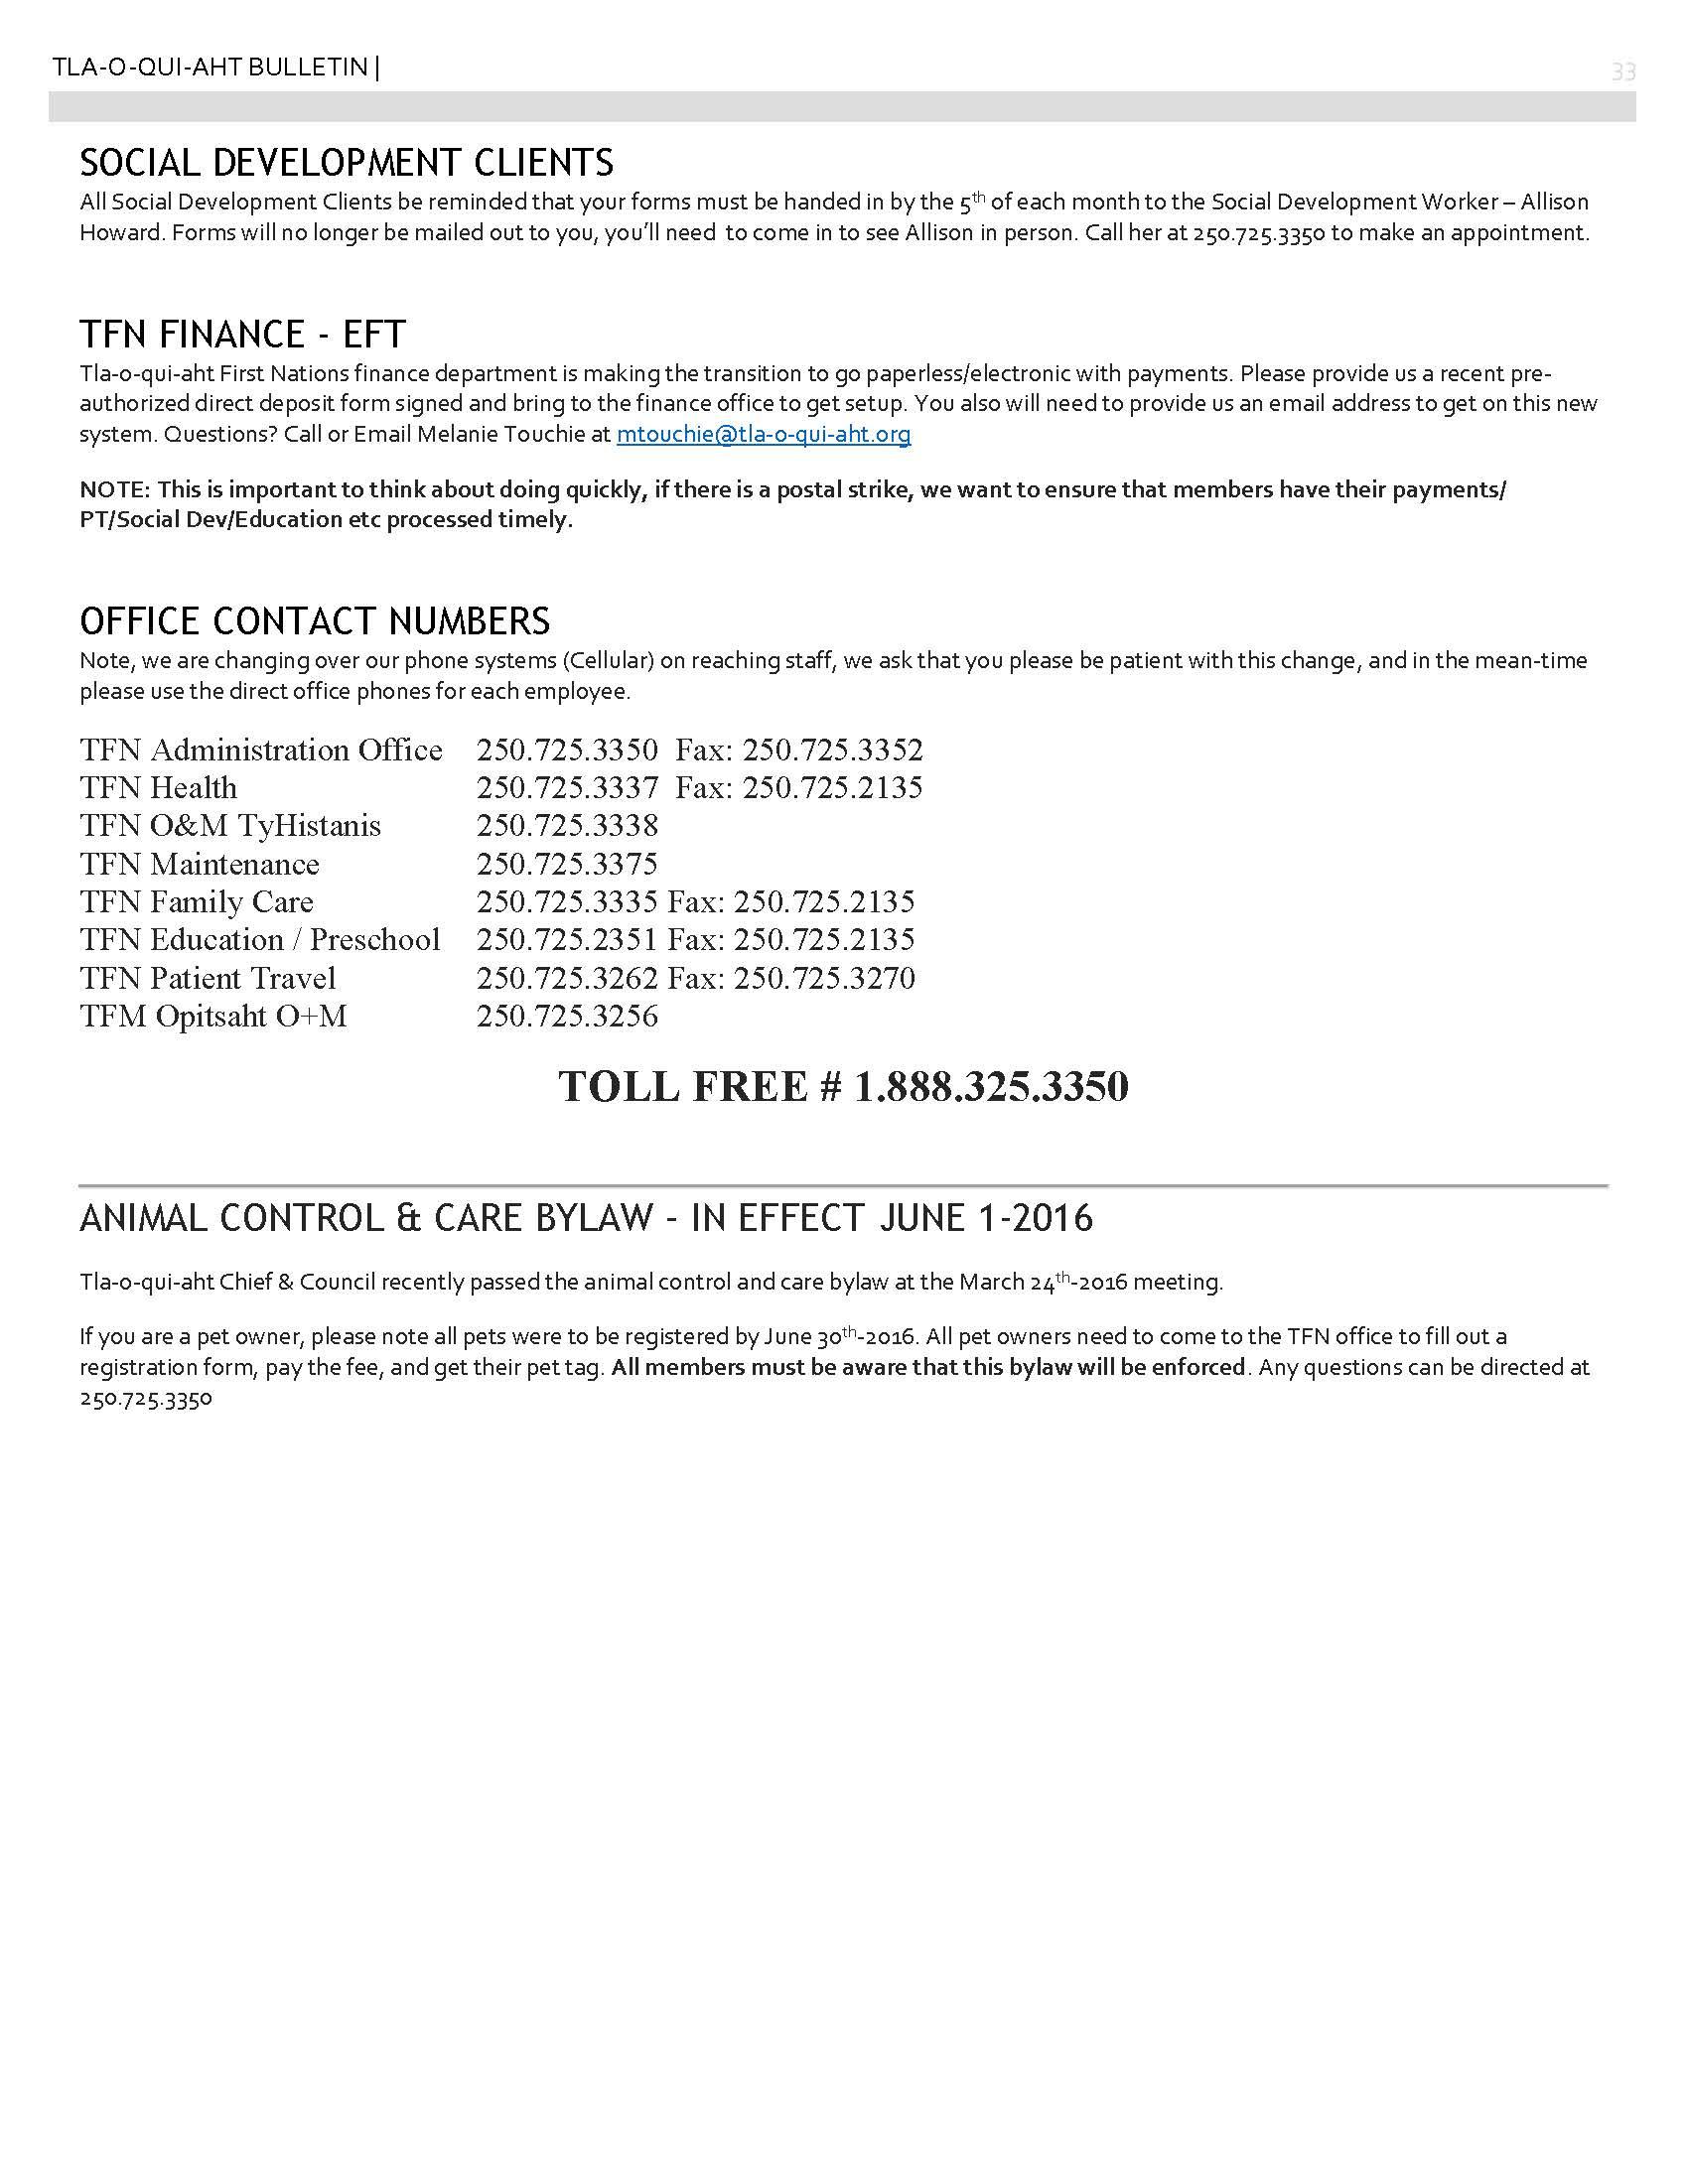 TFN Bulletin Nov 1st 2016_Page_33.jpg